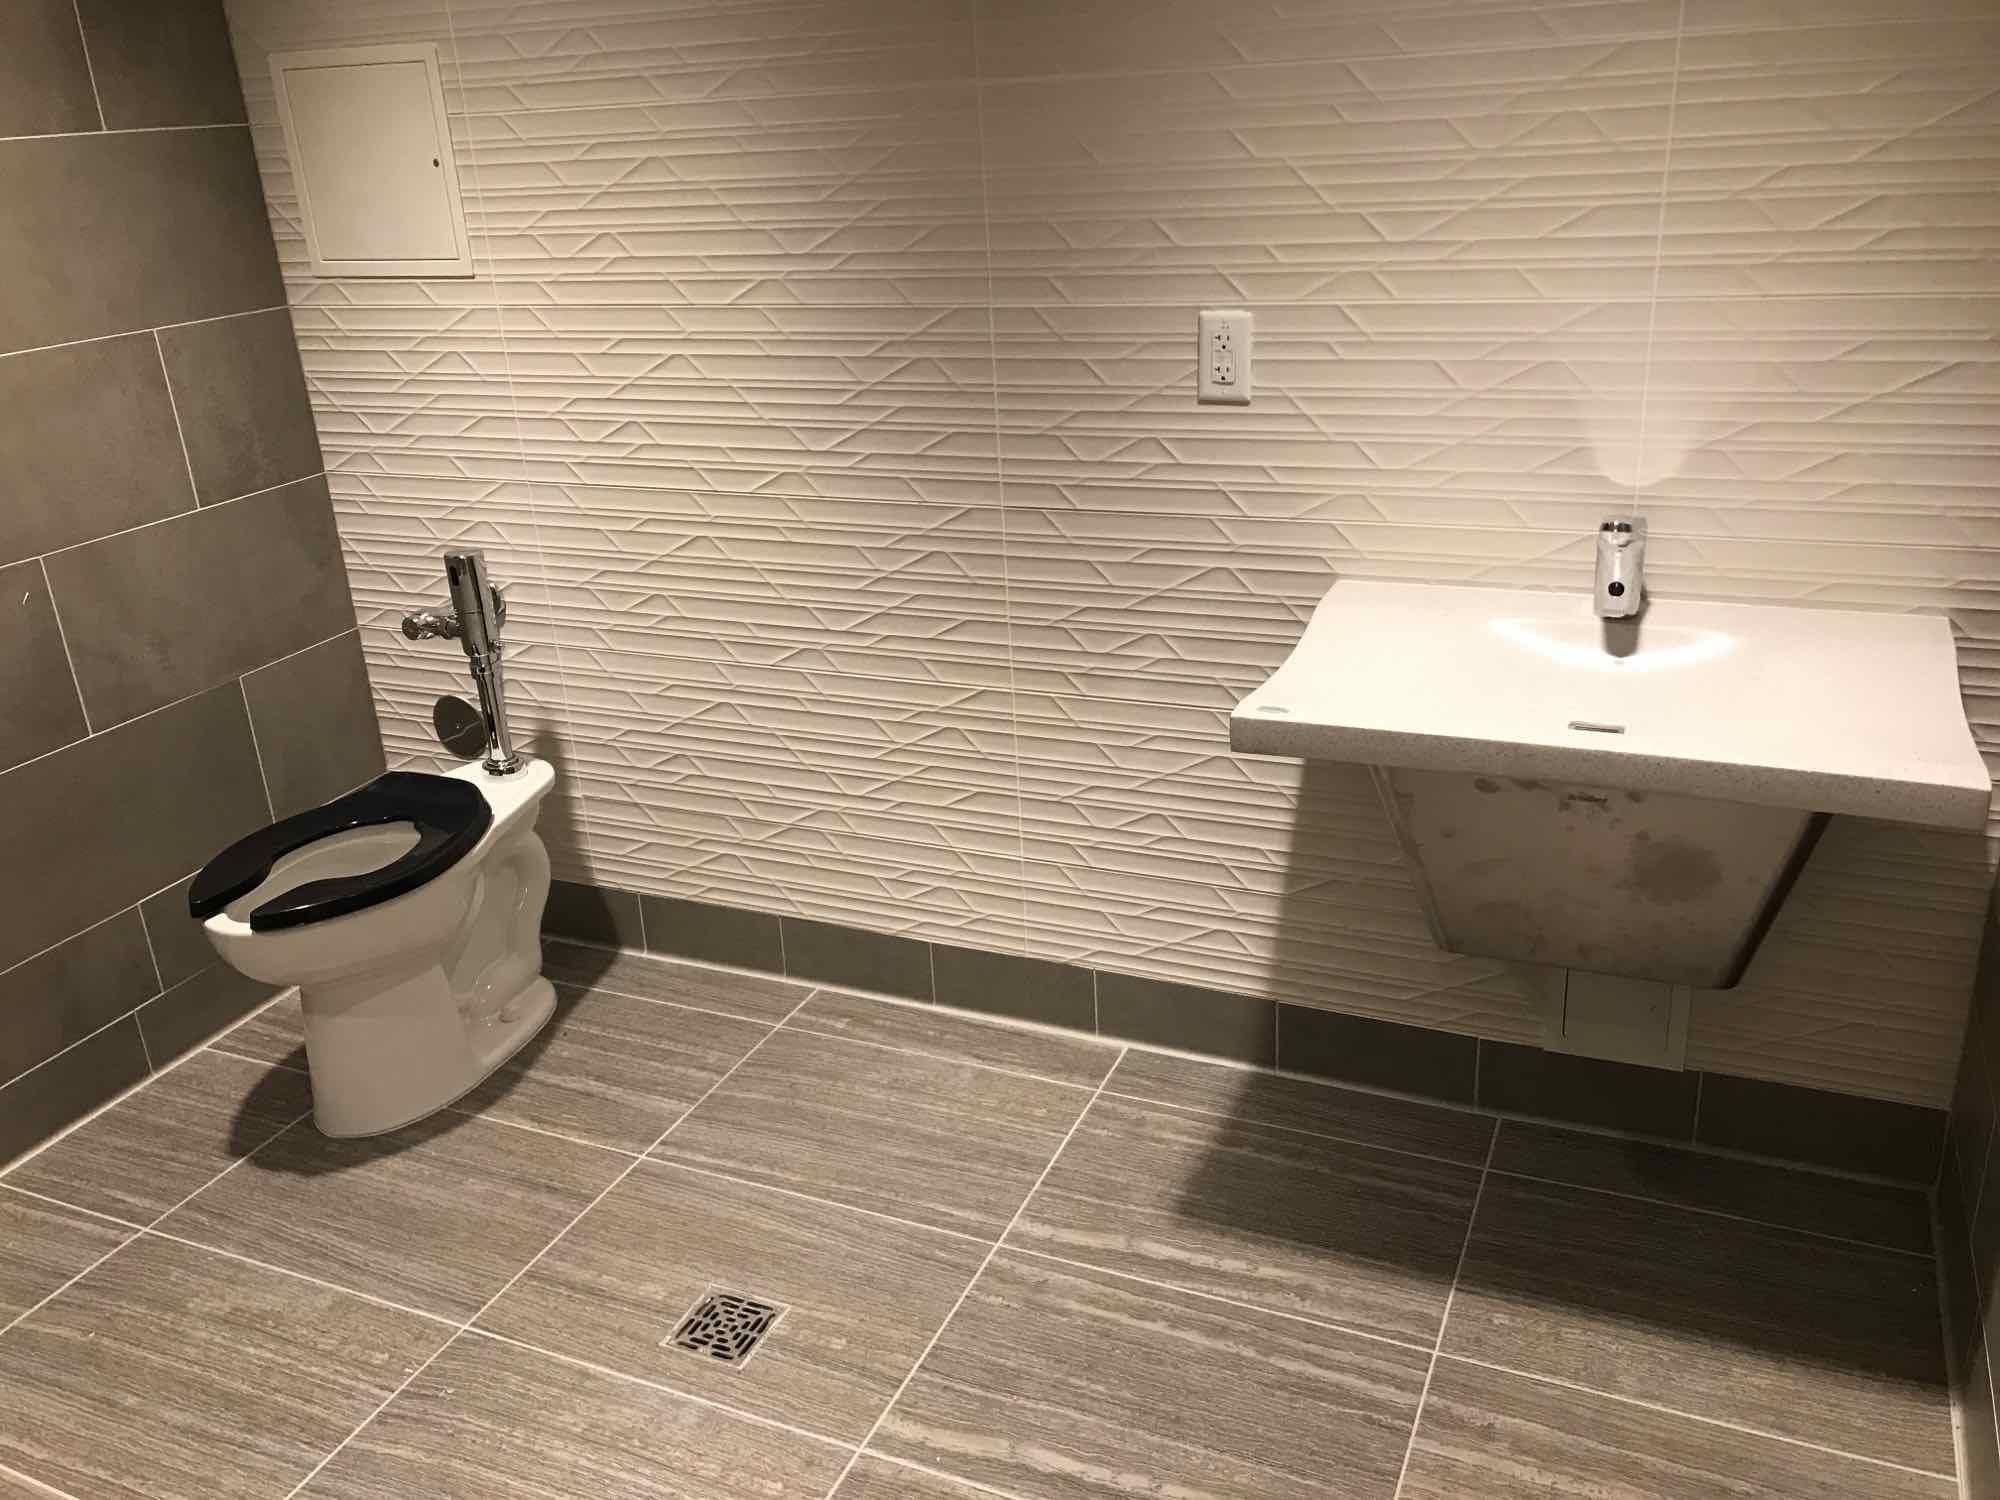 Restroom Progress image 0